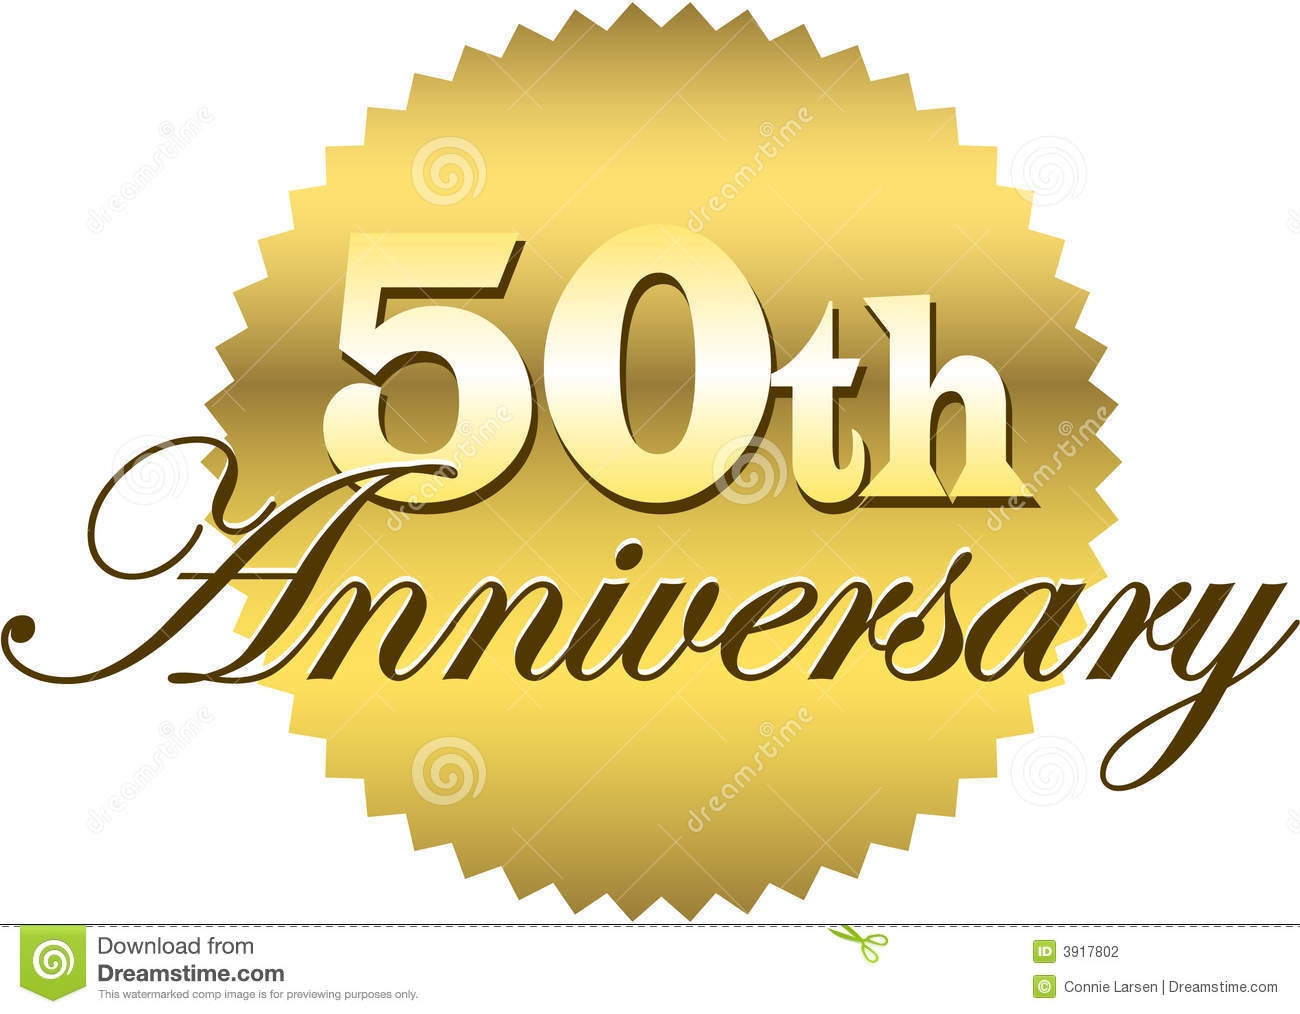 50th wedding anniversary logo ideas Inspirational Golden.